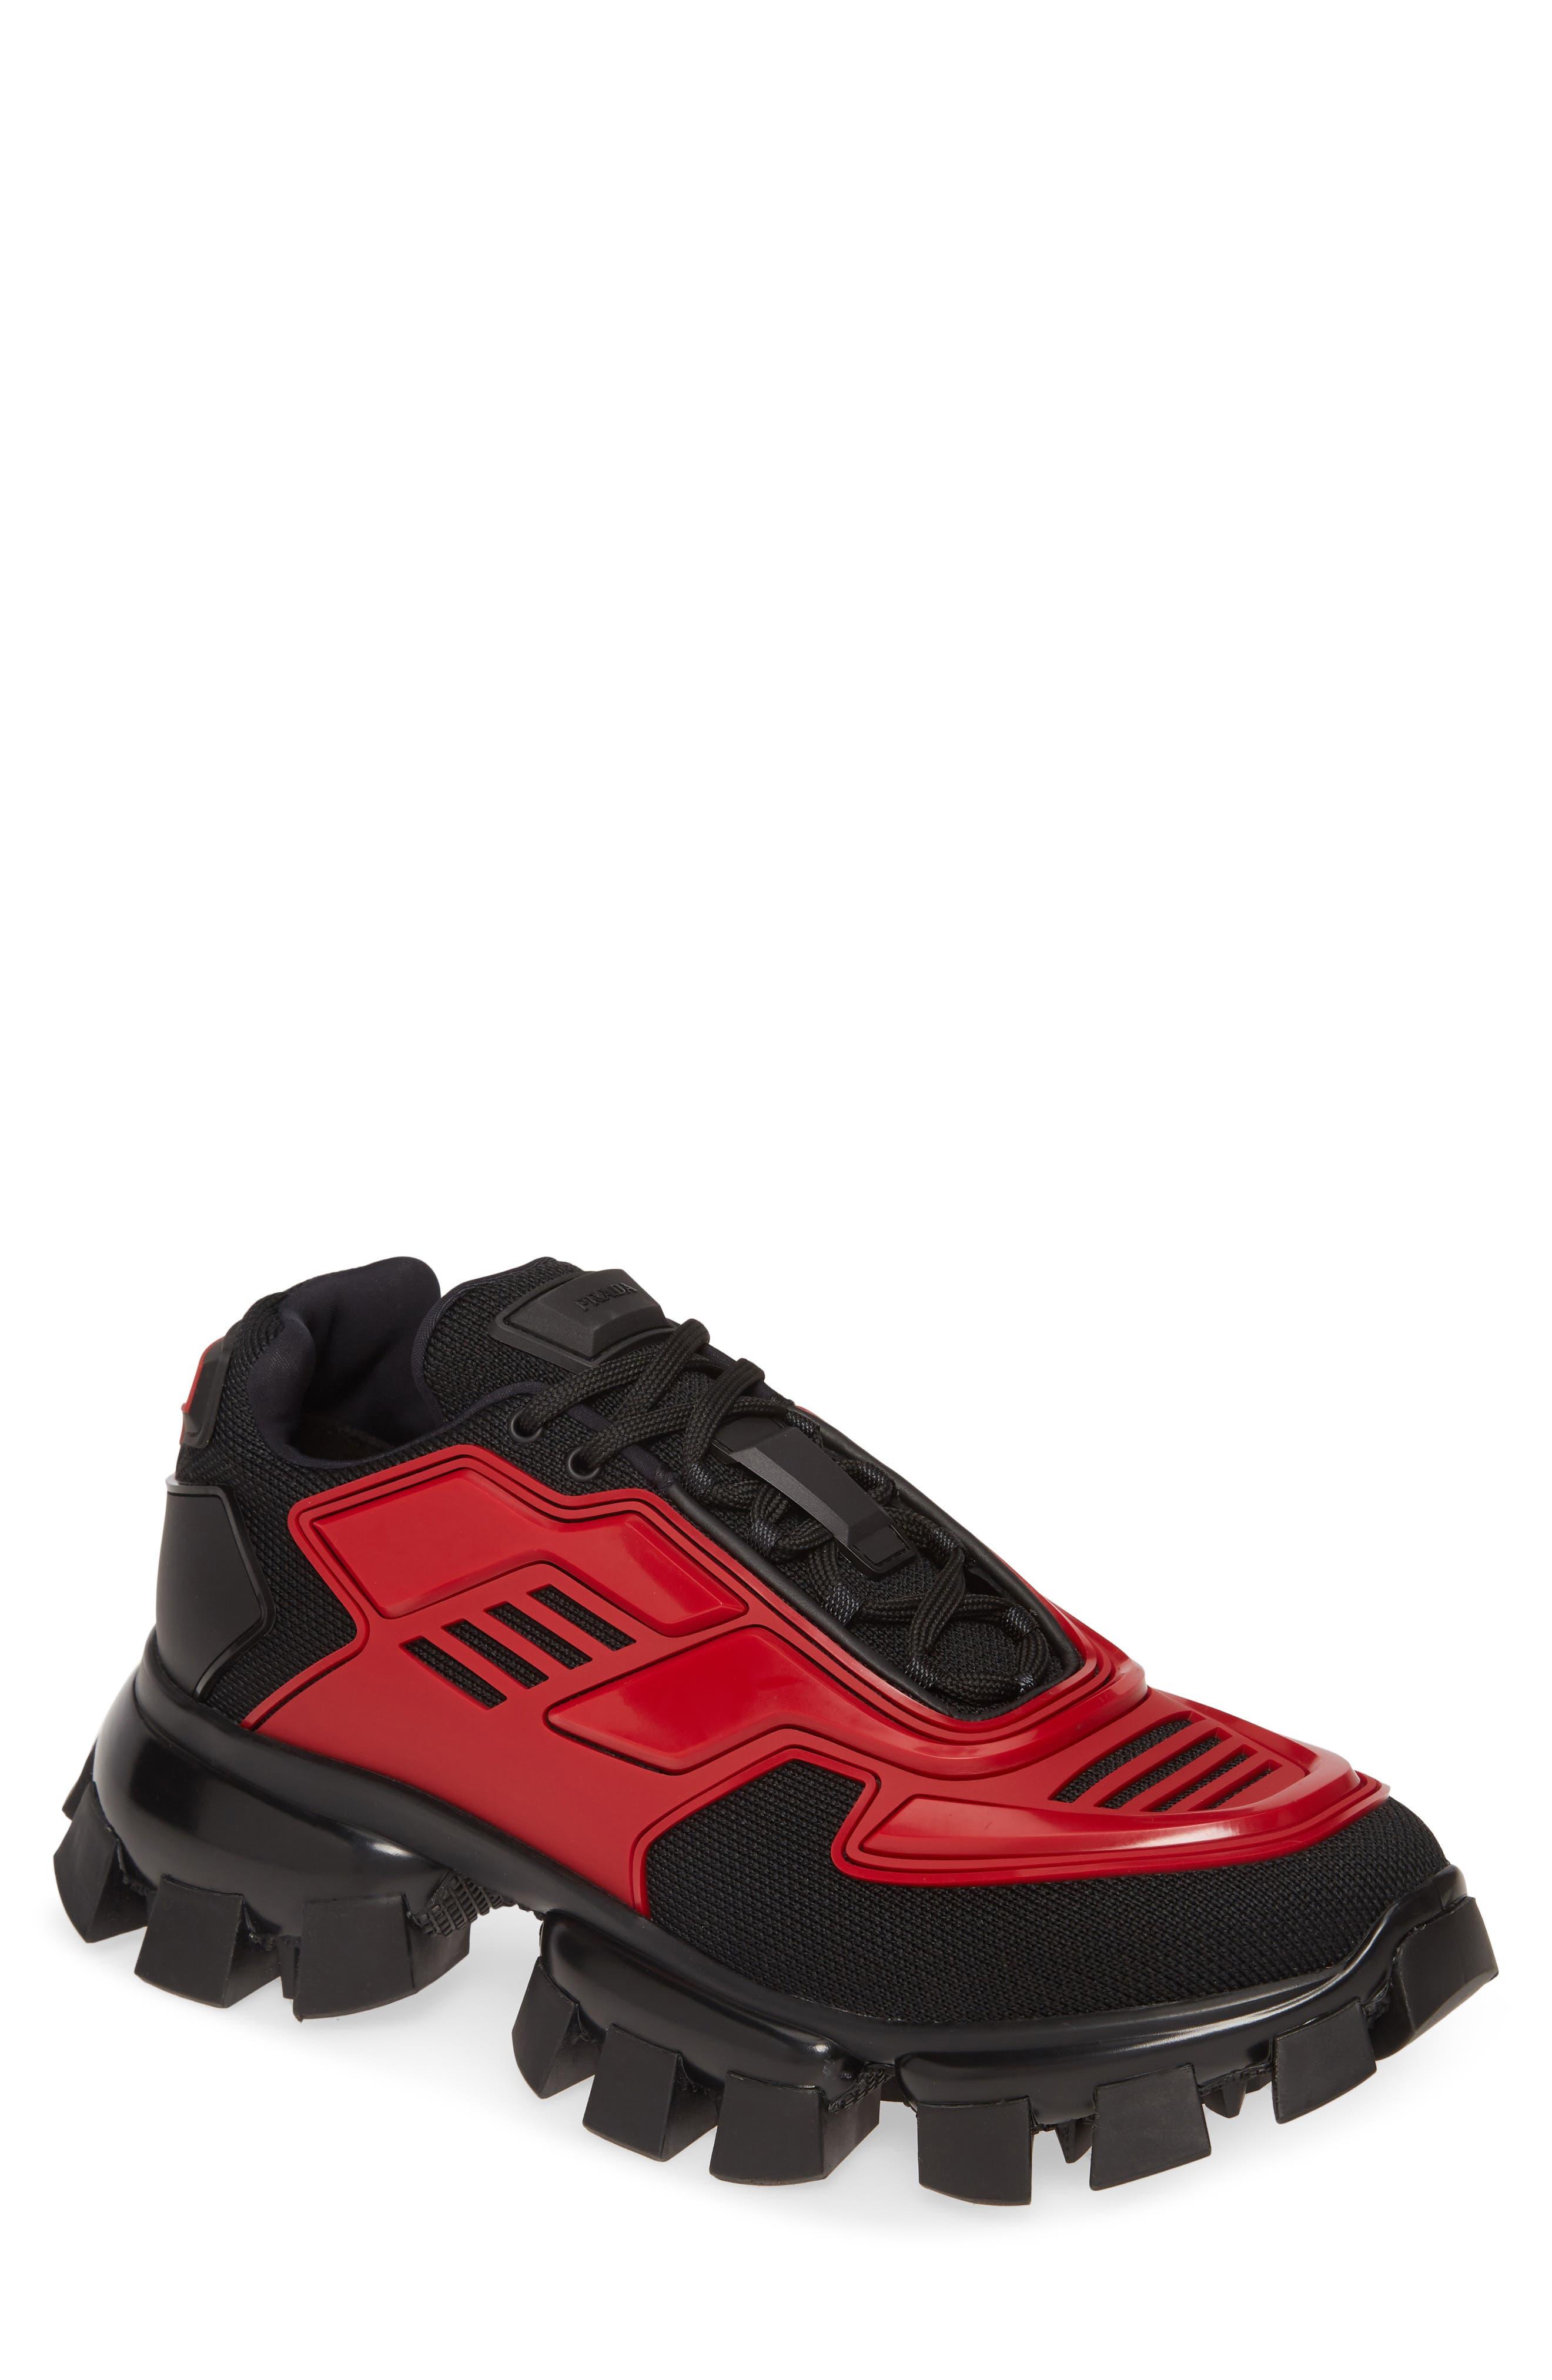 Prada Damen Turnschuhe Bianco + Rosso: : Schuhe